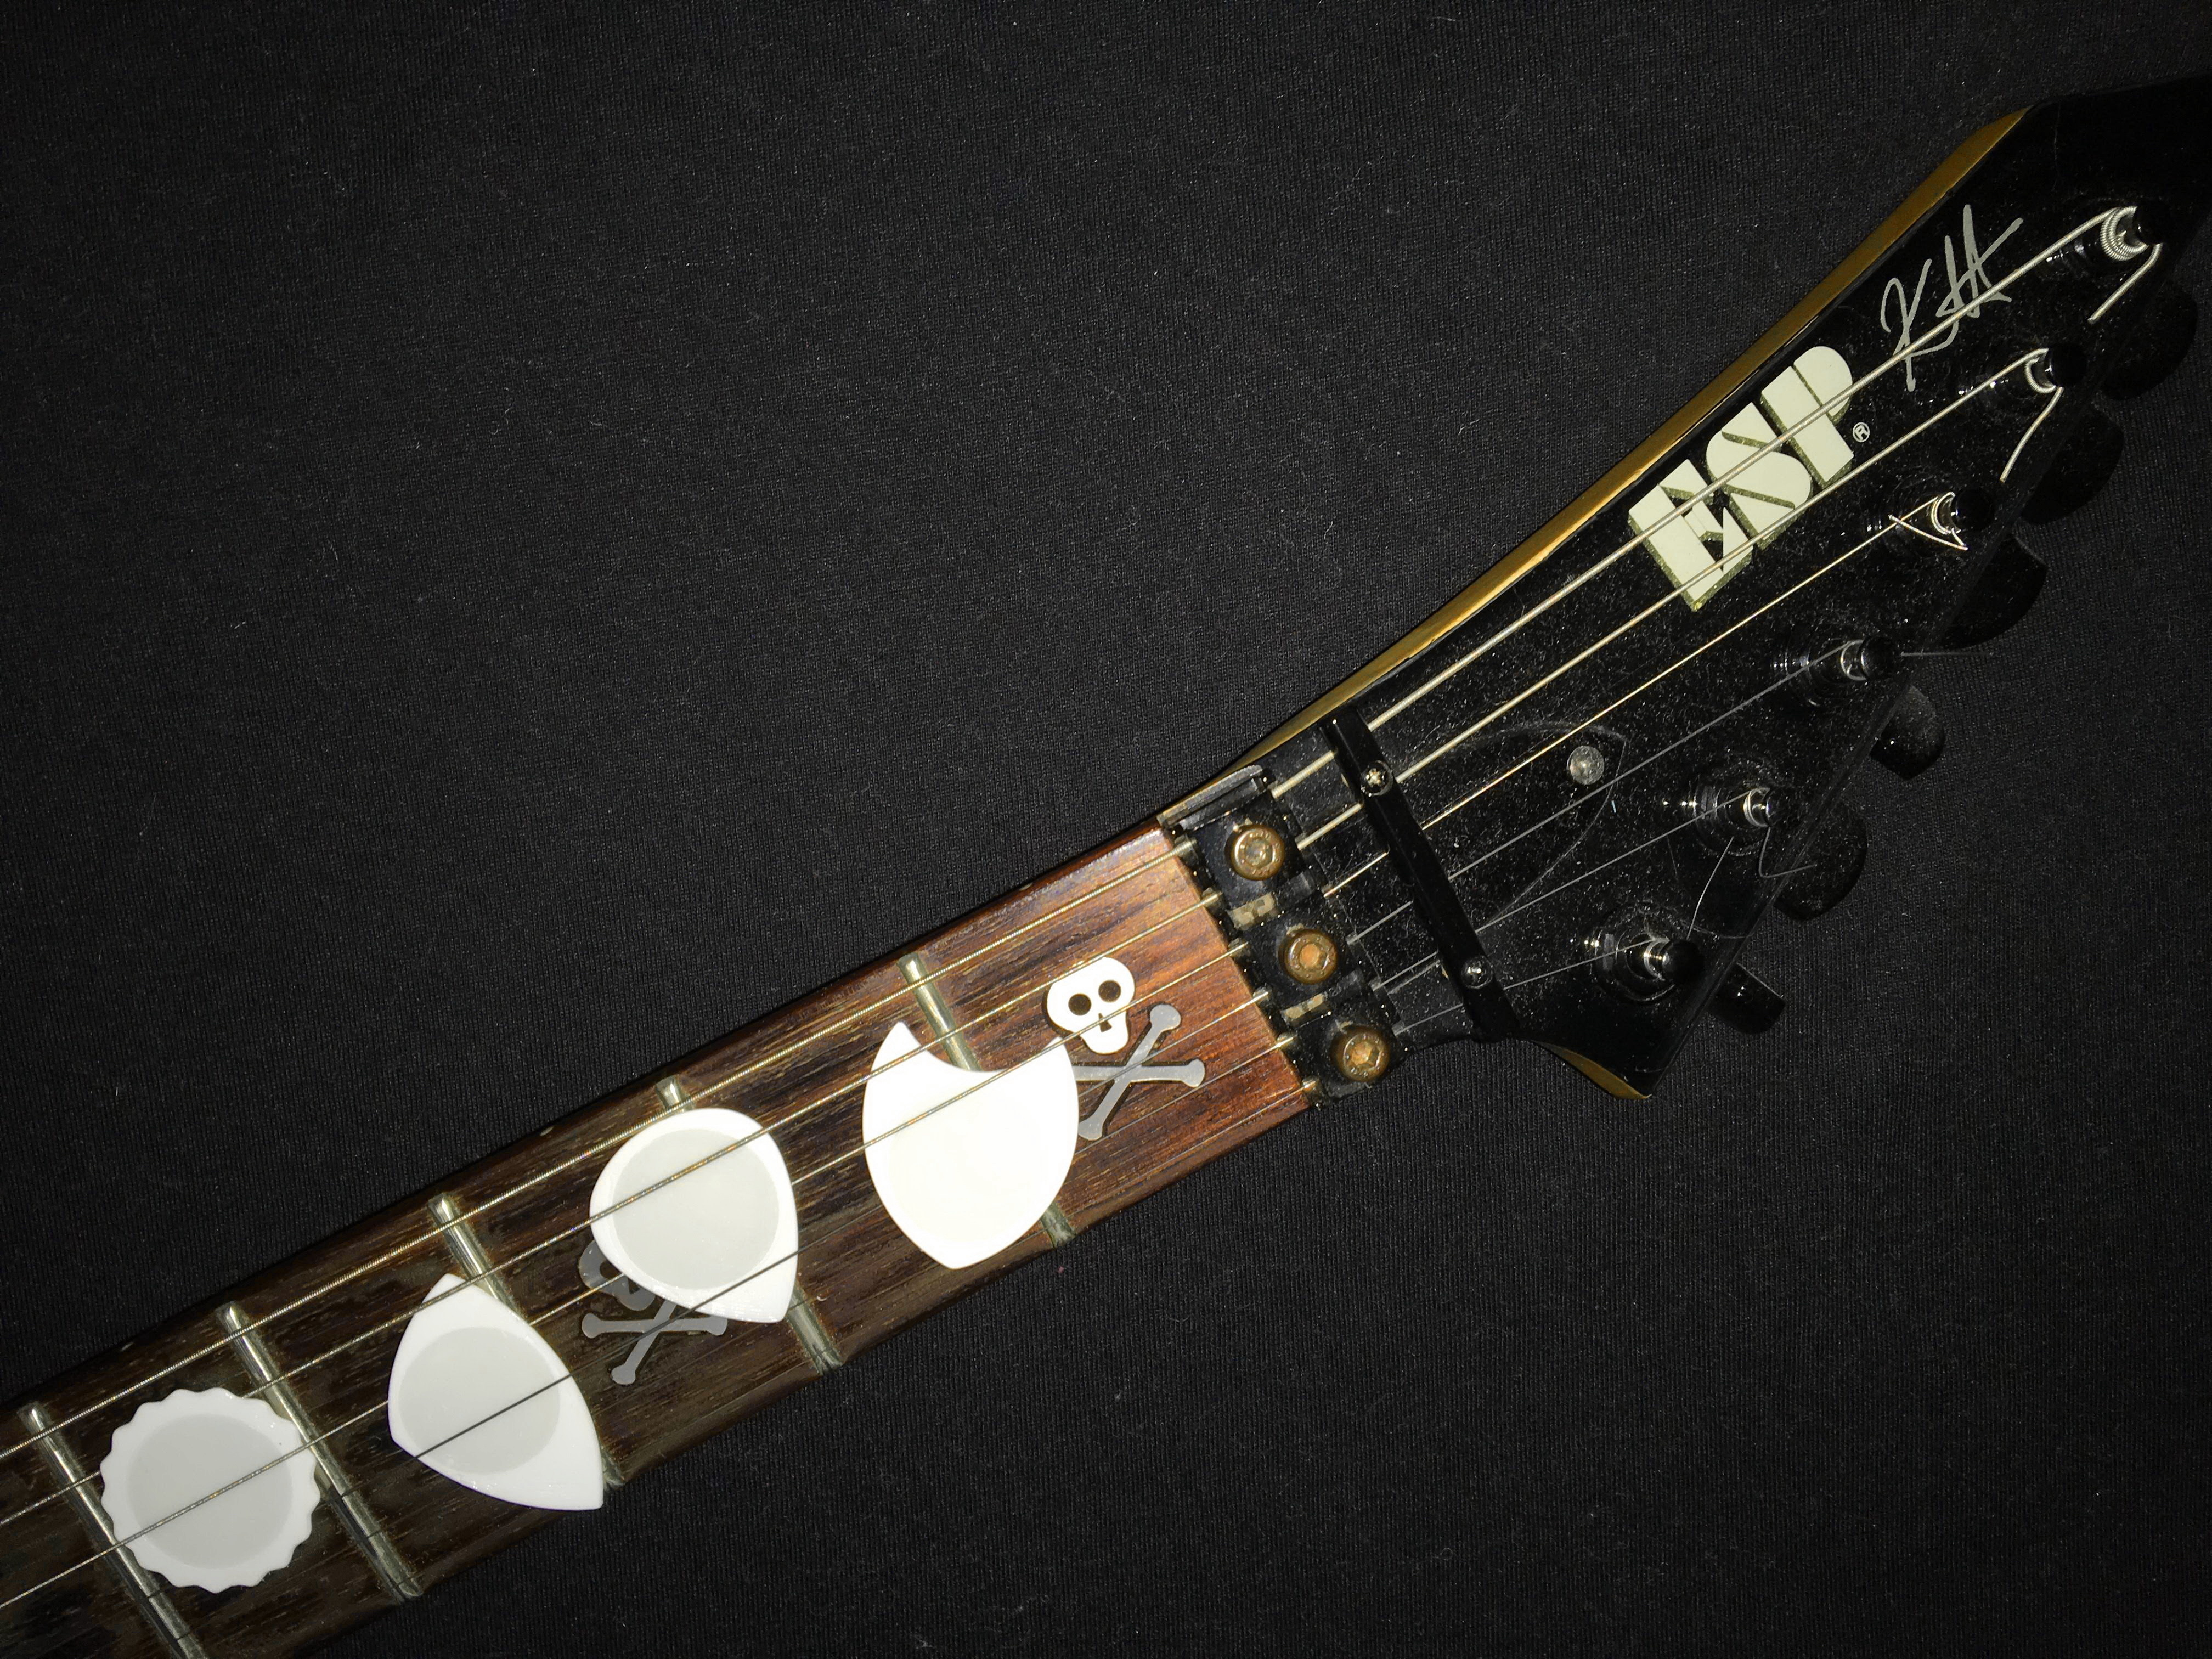 PITA DUA RADON UNU guitar ESP Km.JPG Descargar archivo STL gratis PITA R9'5 23X36 pua guitarra electrica • Objeto para impresión 3D, carleslluisar